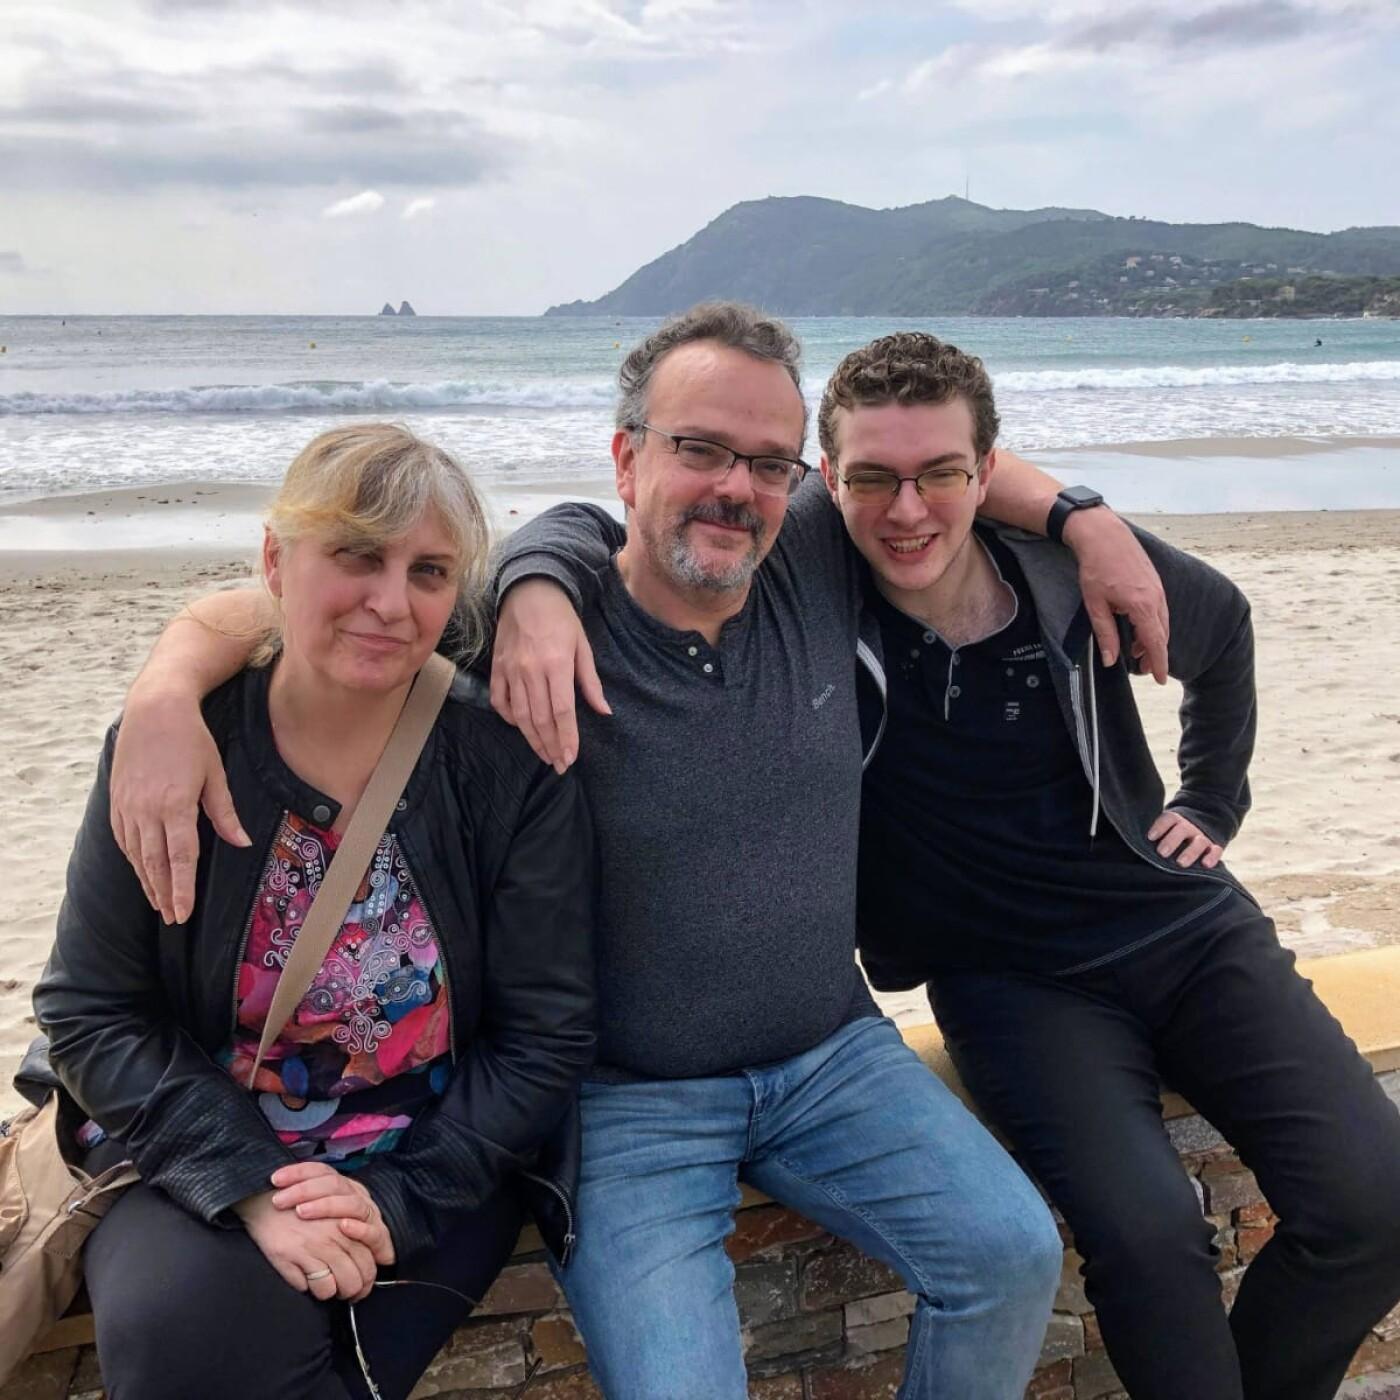 Christine et Patrice détestent la routine, voici la famille nomade digitale - 25 05 2021 - StereoChic Radio